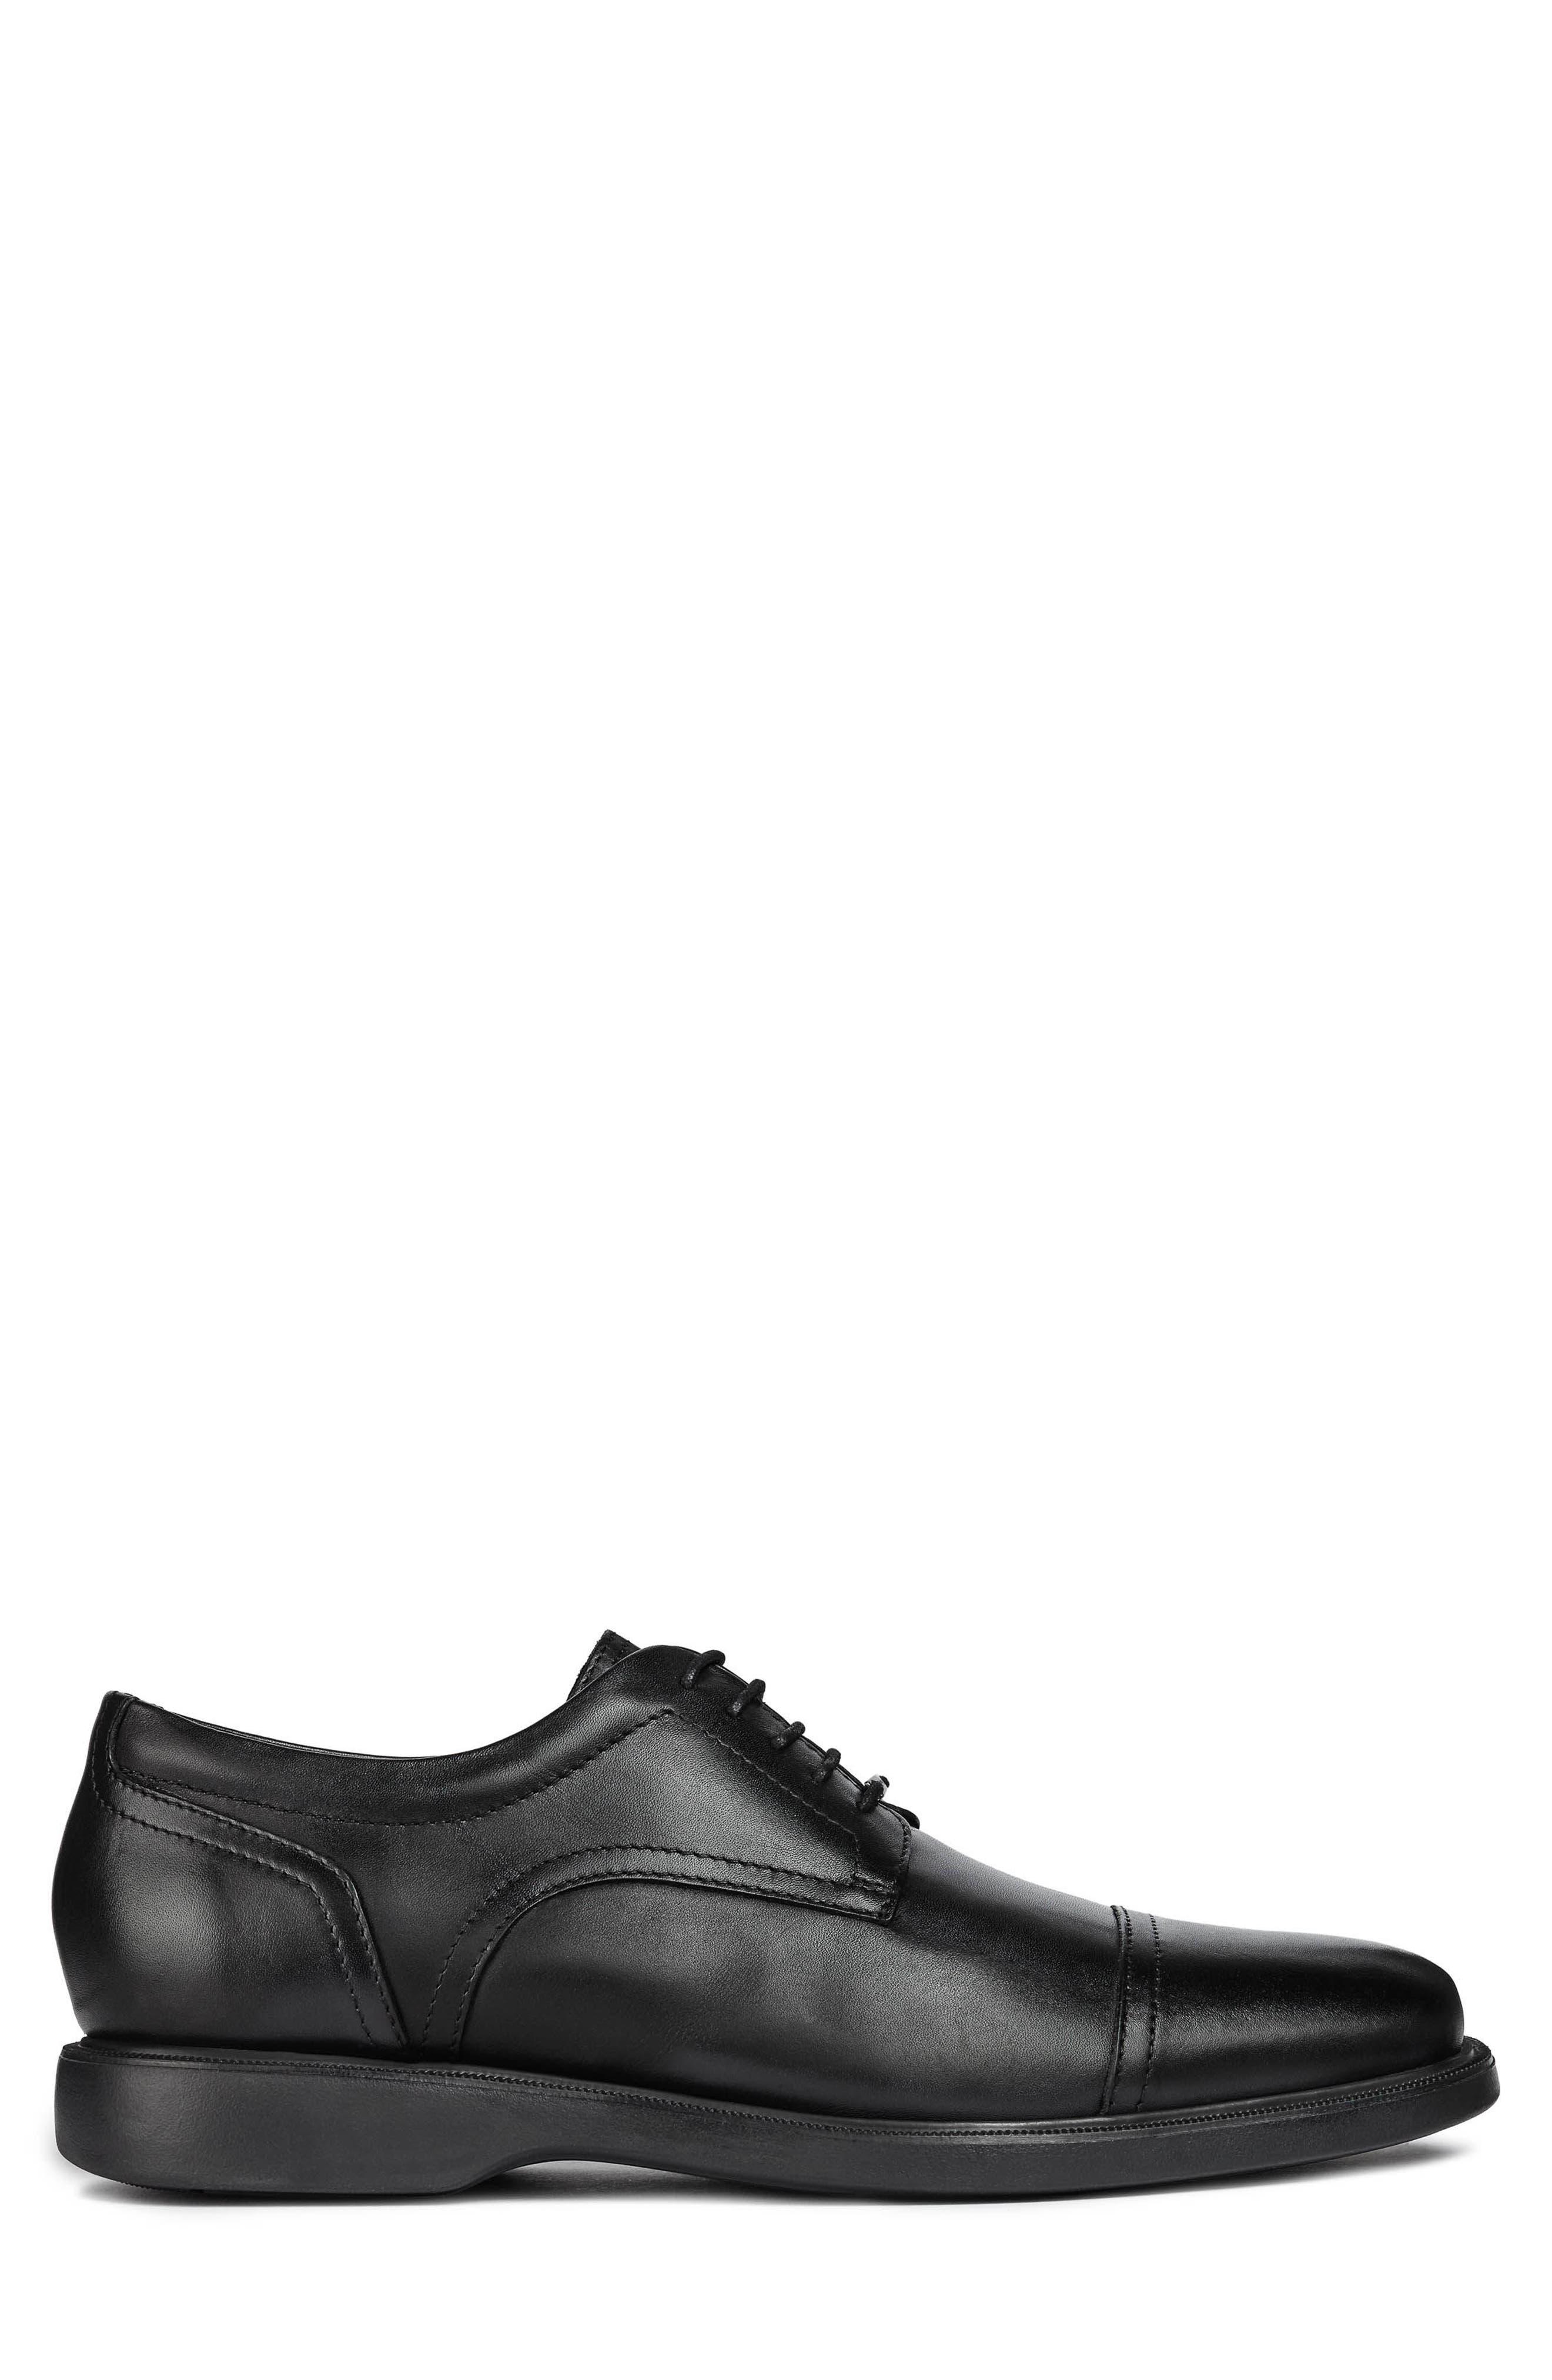 Brayden 2Fit ABX 9 Waterproof Cap Toe Derby,                             Alternate thumbnail 3, color,                             BLACK LEATHER